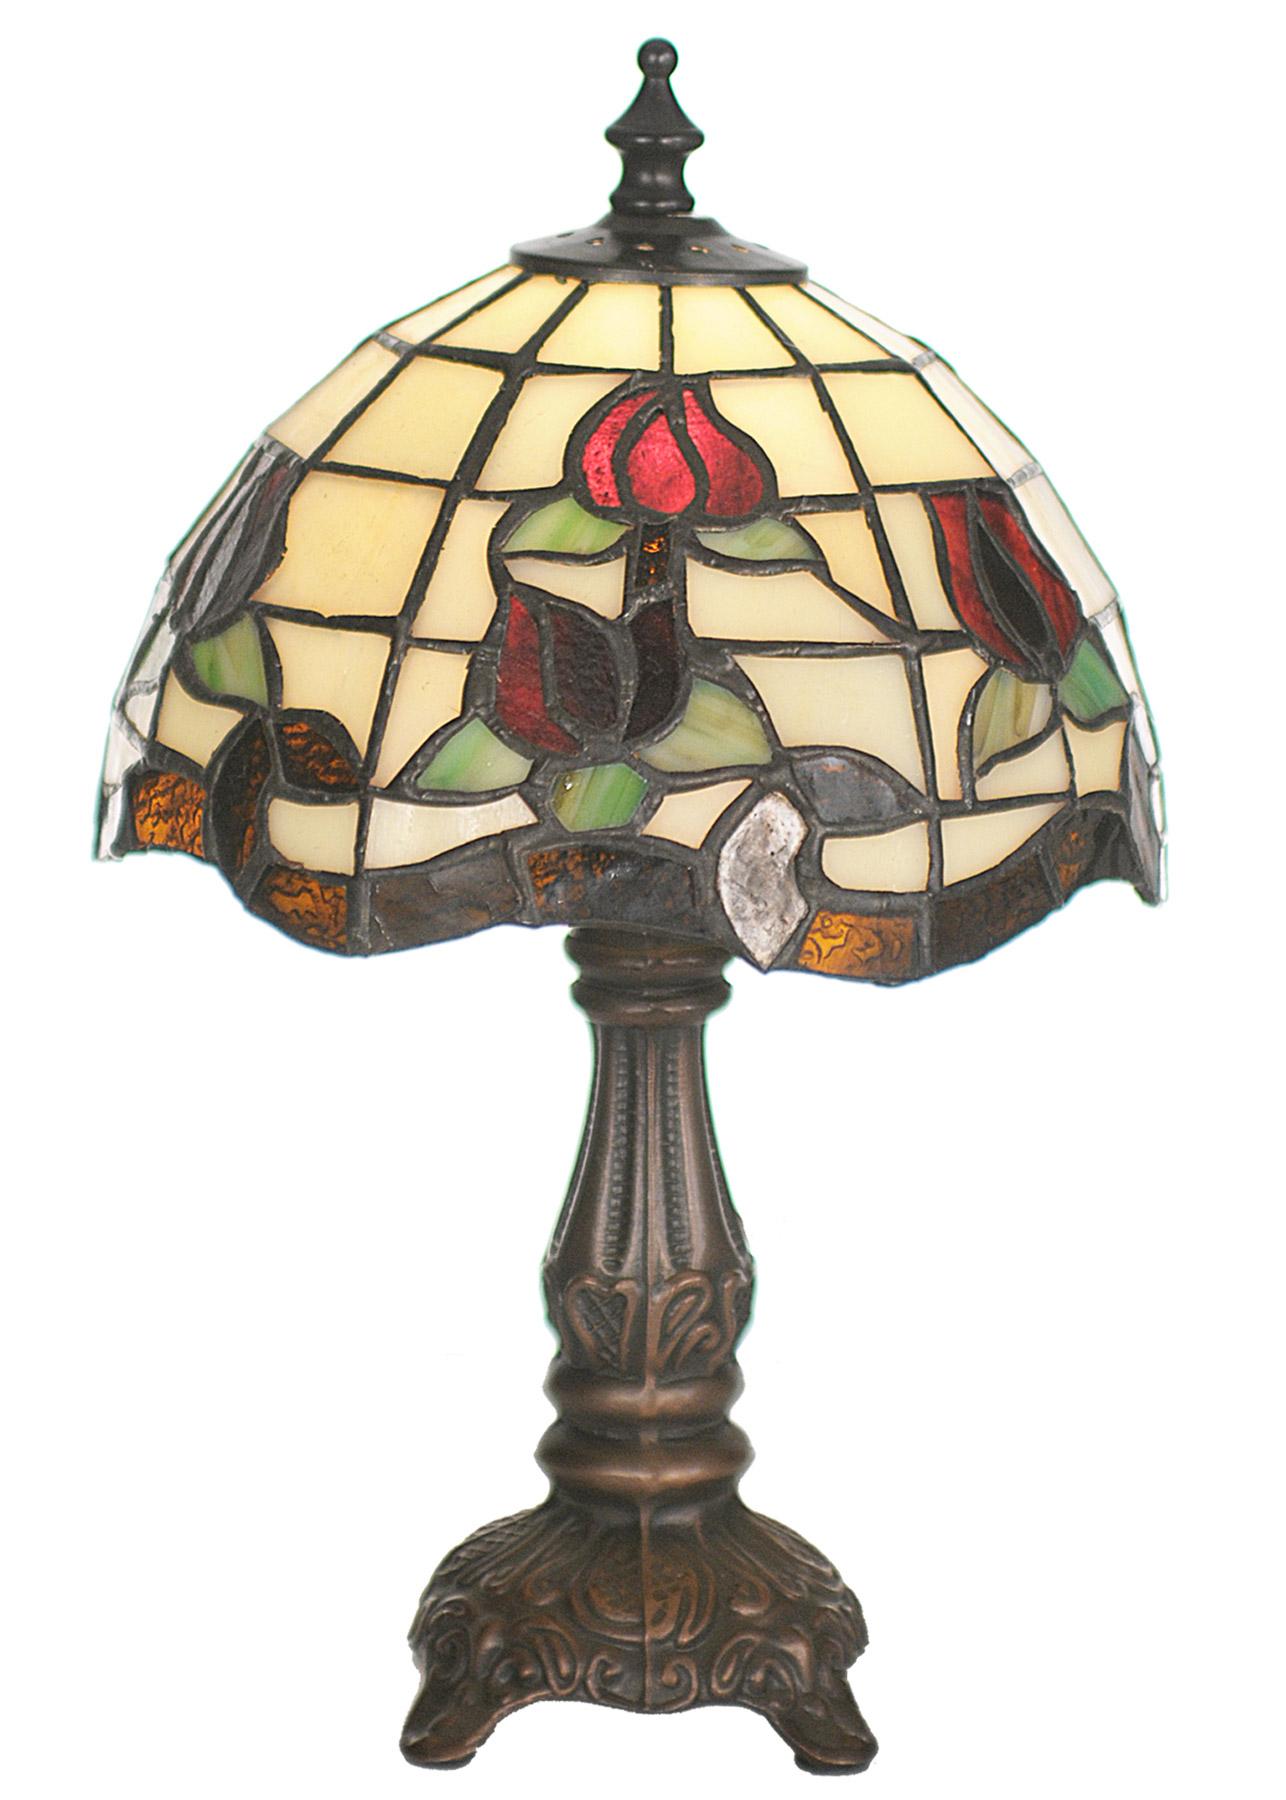 meyda 19189 tiffany roseborder table lamp. Black Bedroom Furniture Sets. Home Design Ideas